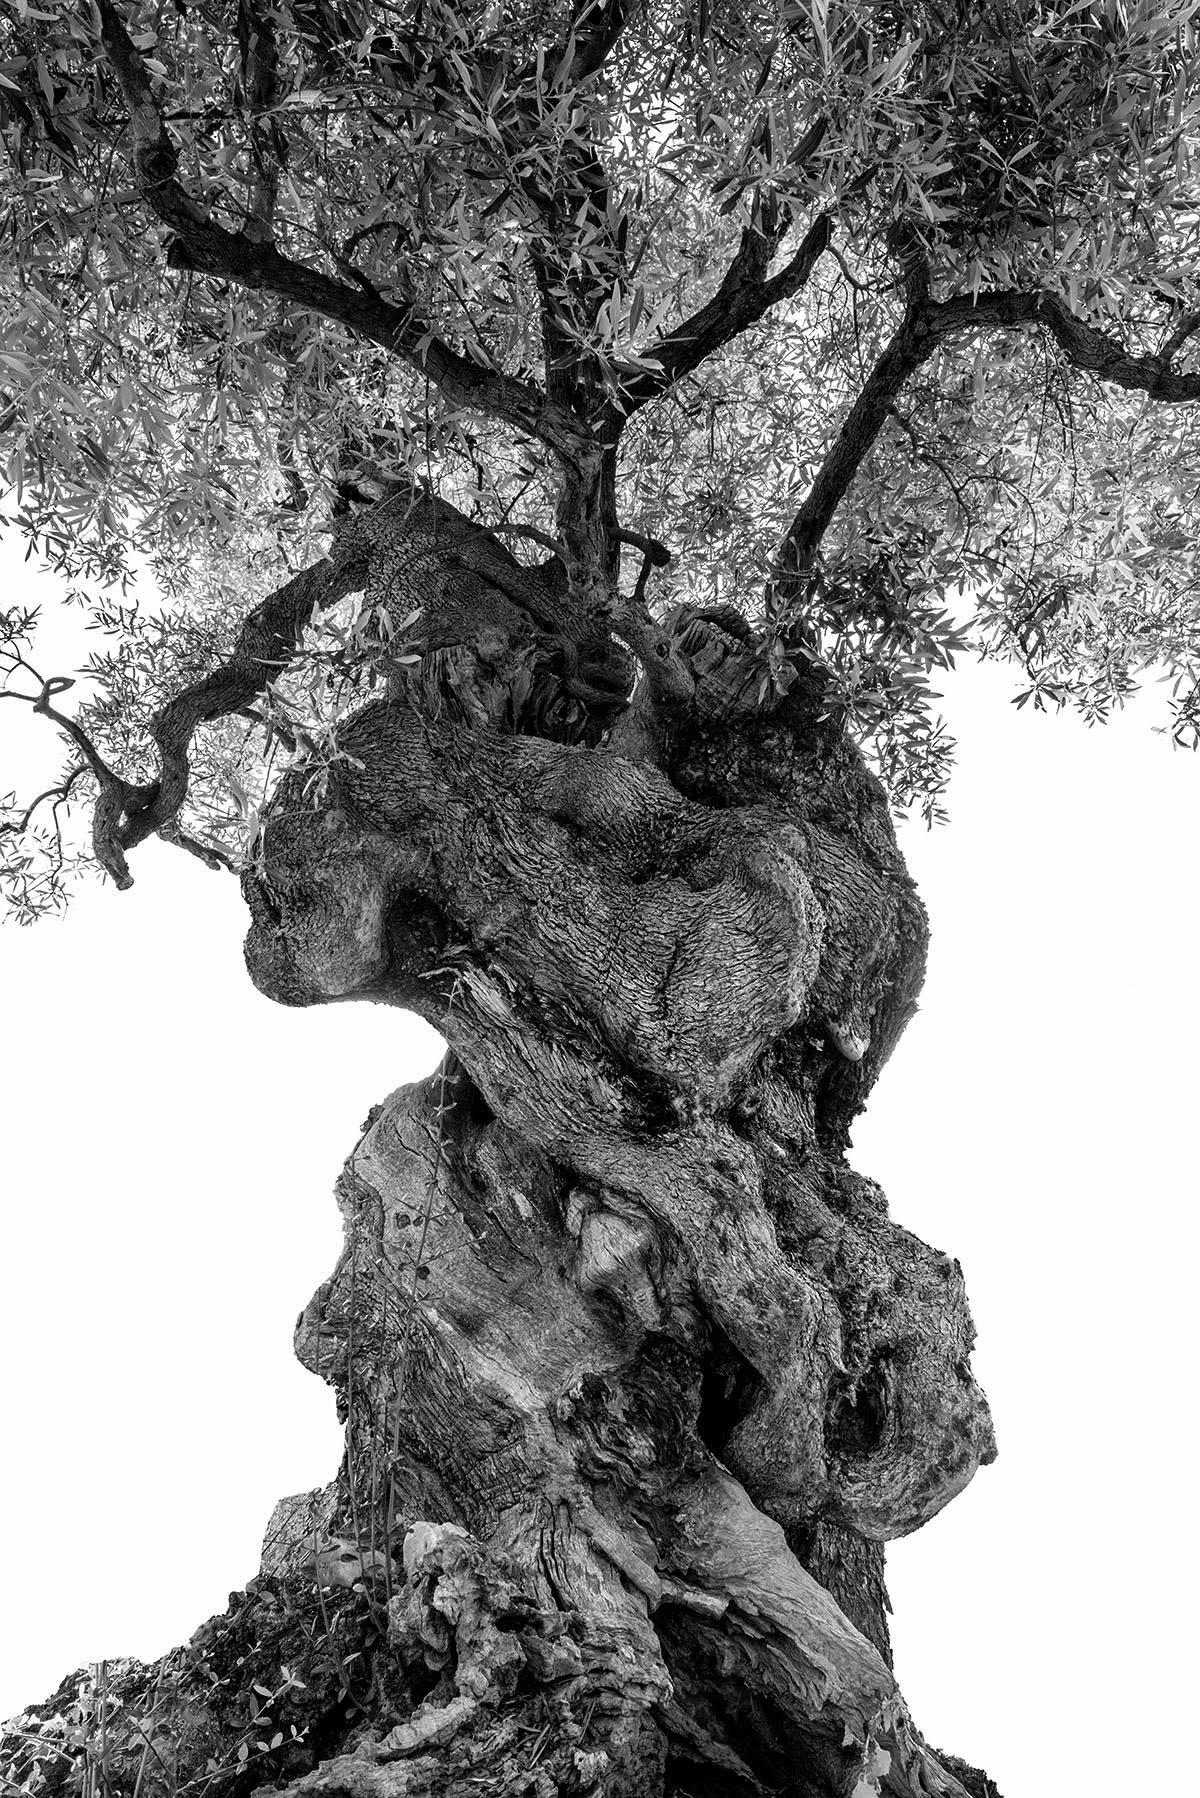 martin-ogolter-Monumentali-nature-landscape-photographer-14